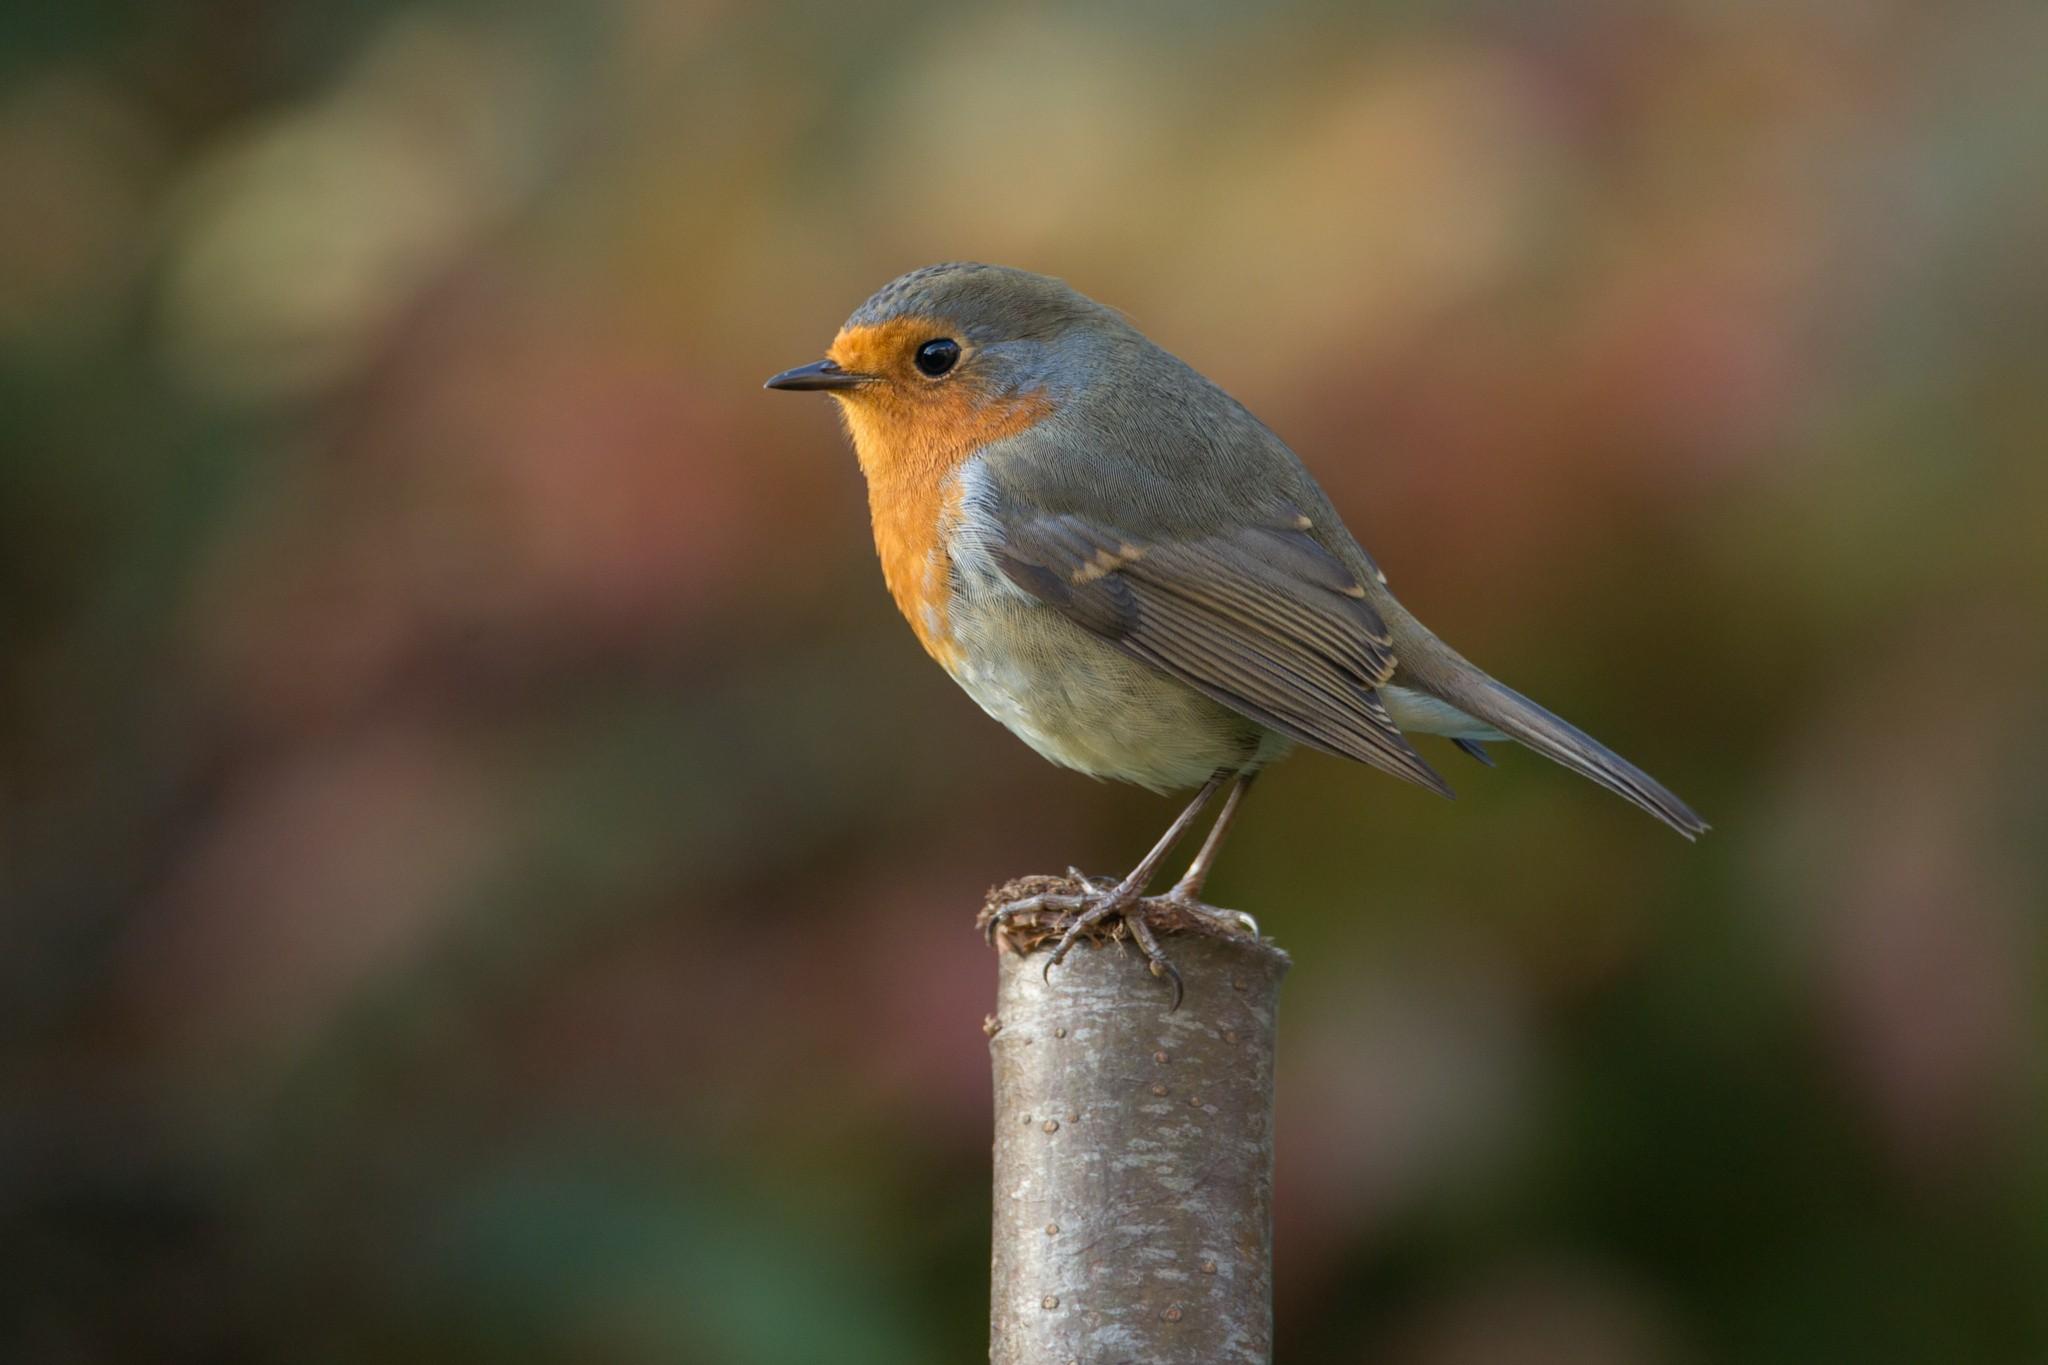 Robin Bird Photography, Hd Birds, 4k Wallpapers, Images